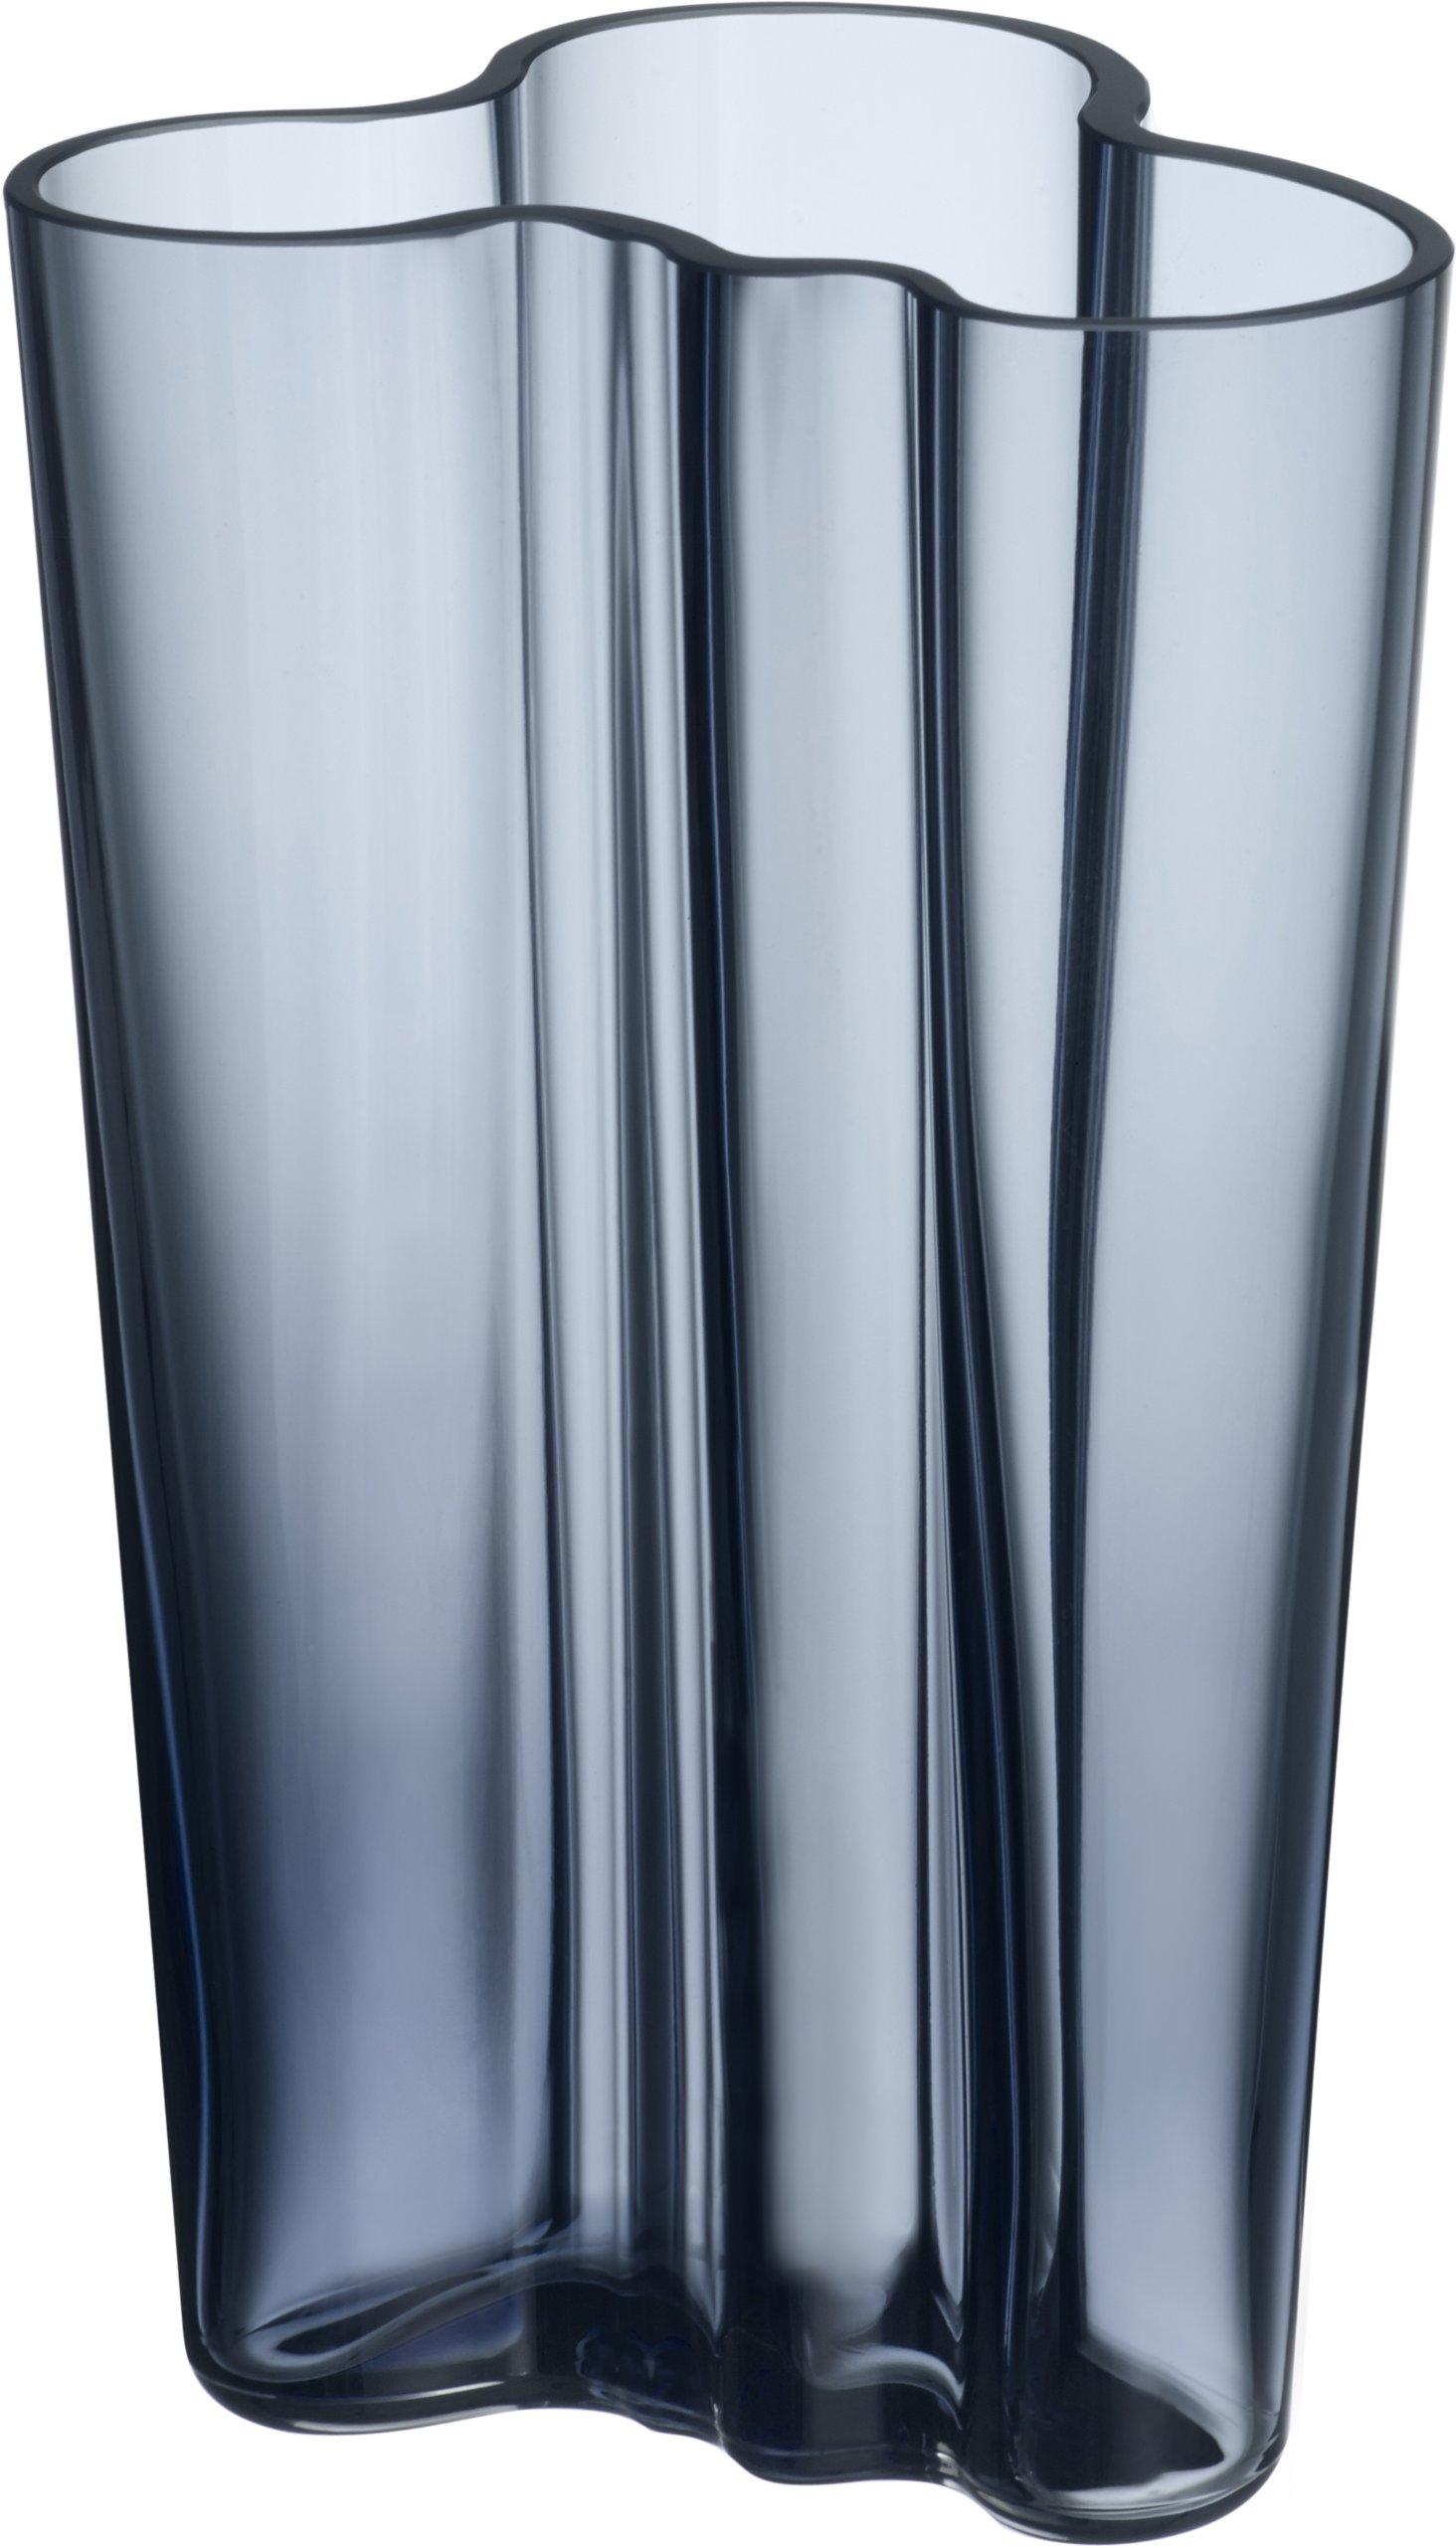 Iittala Aalto Finlandia Vase 7.75'' Rain by Iittala